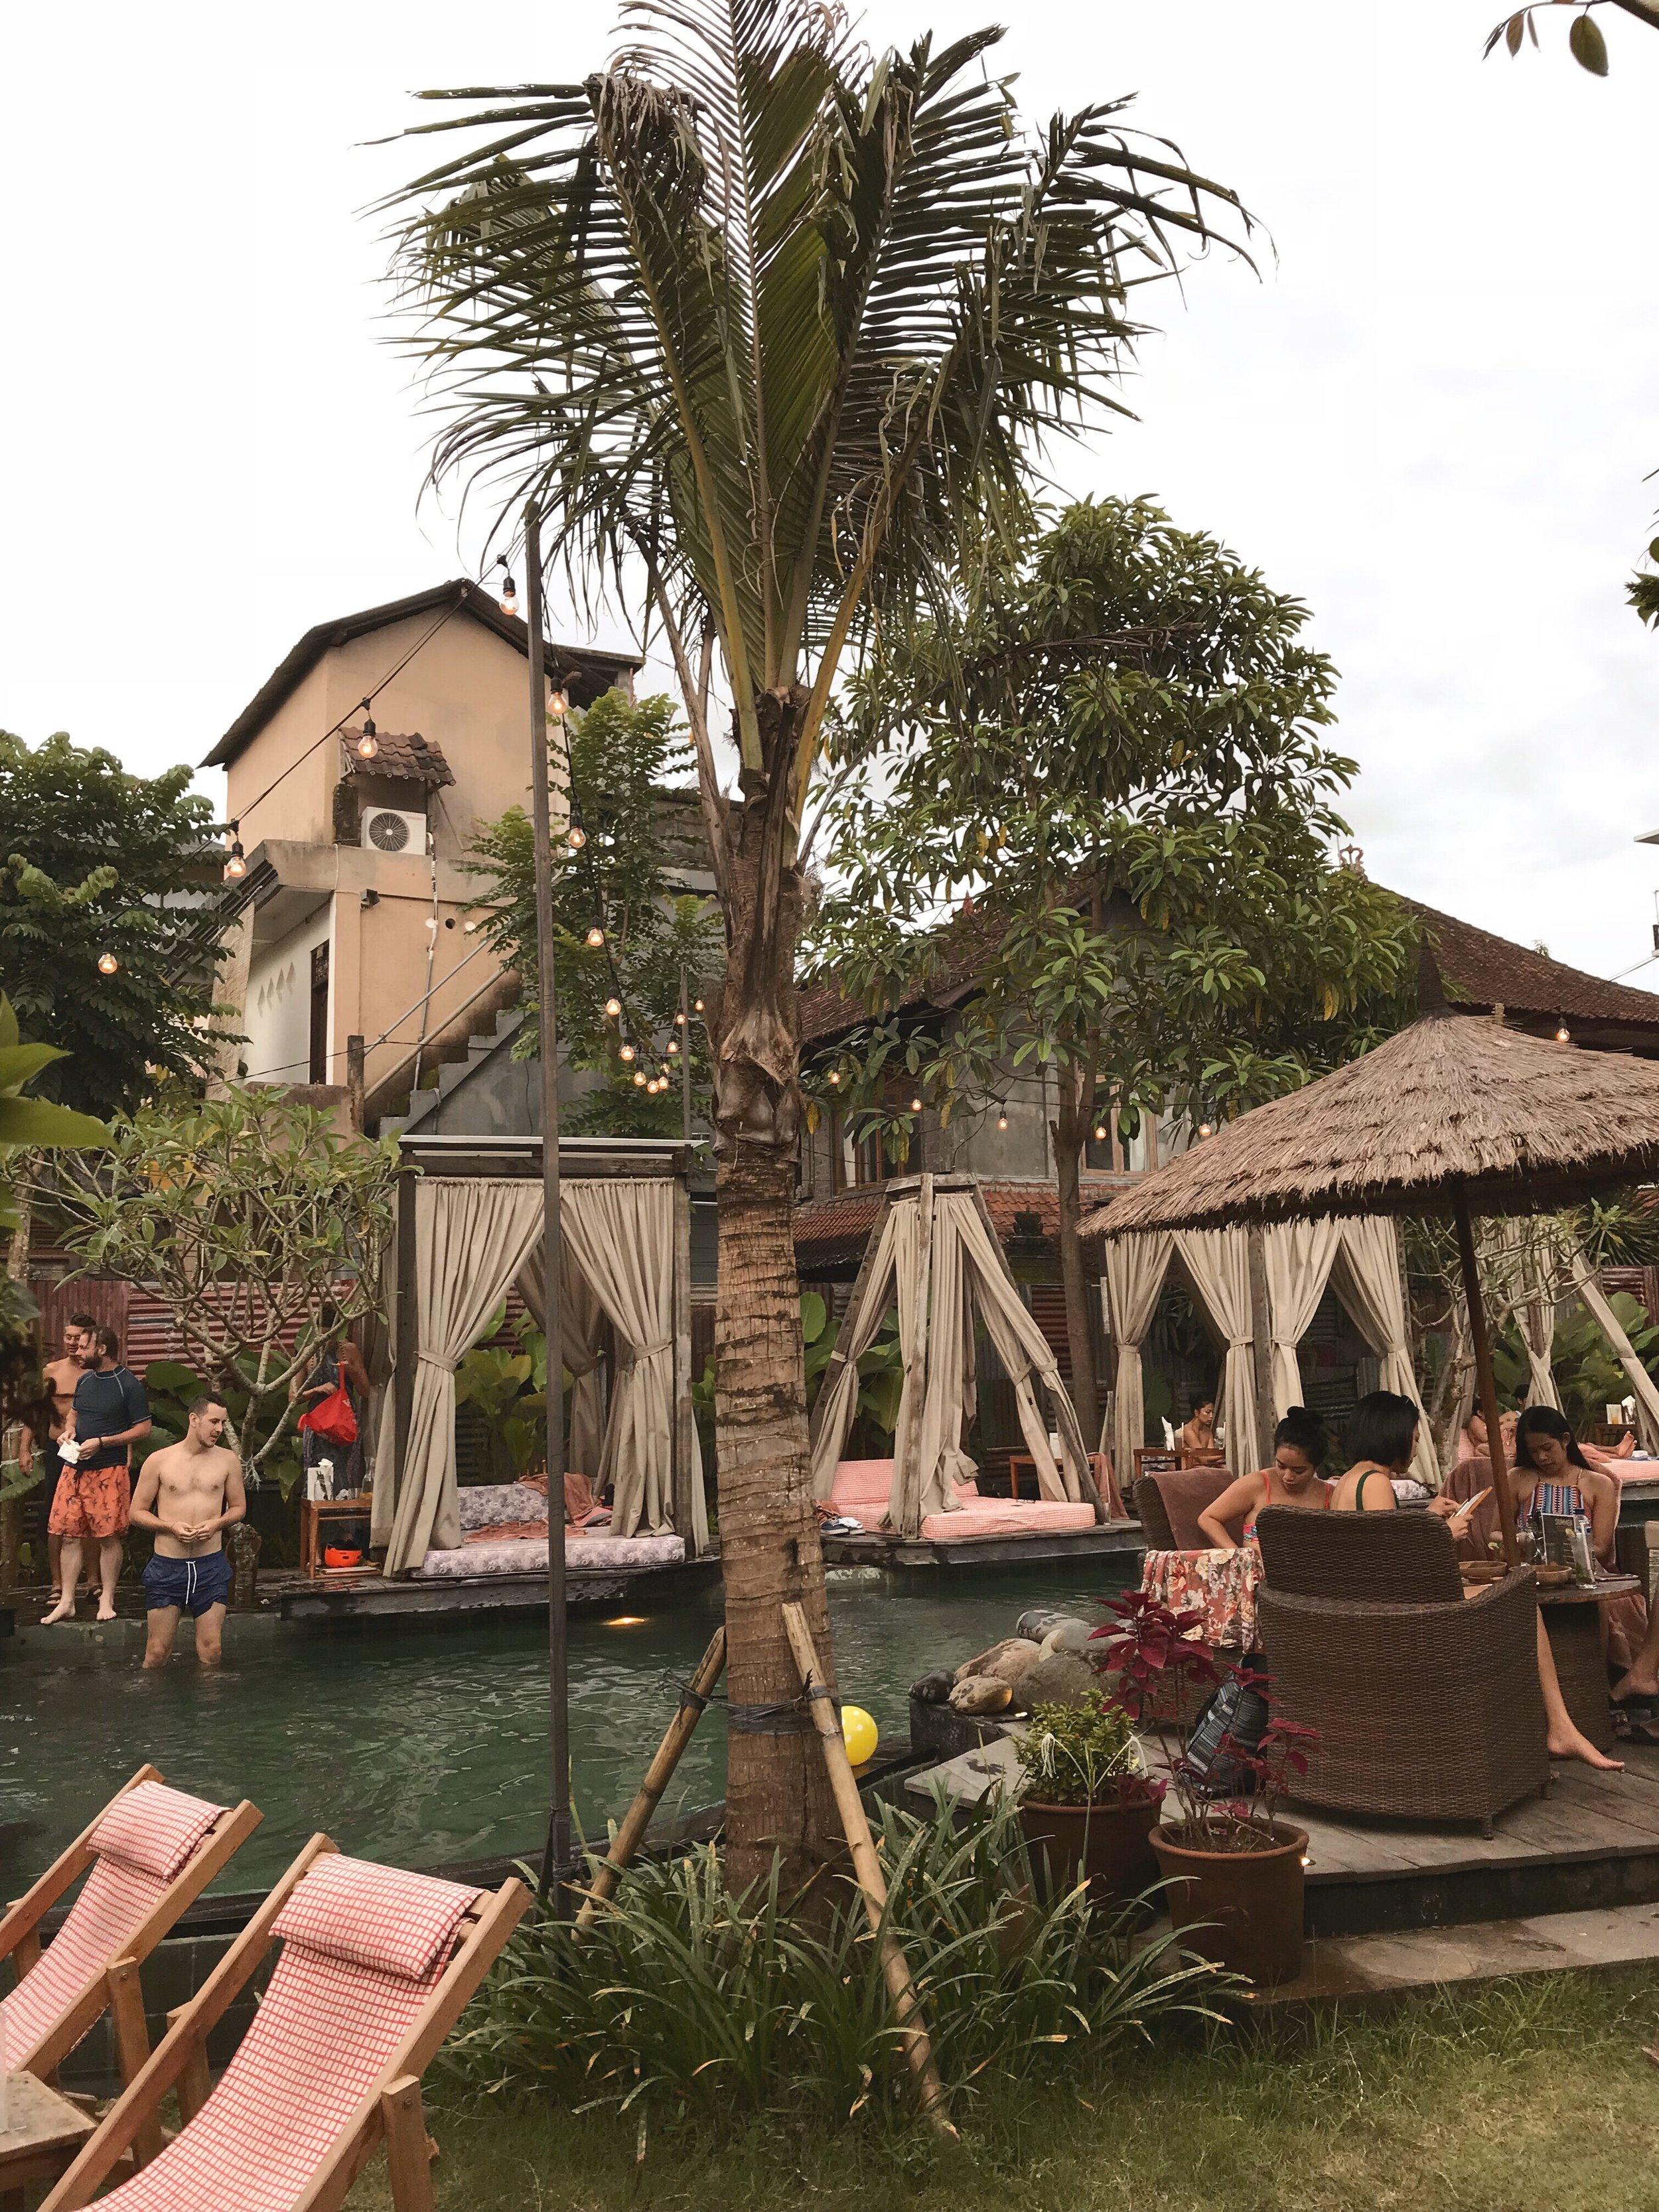 Where to find Folk Pool & Gardens - Jl Monkey Forest, Ubud, Bali, 80571